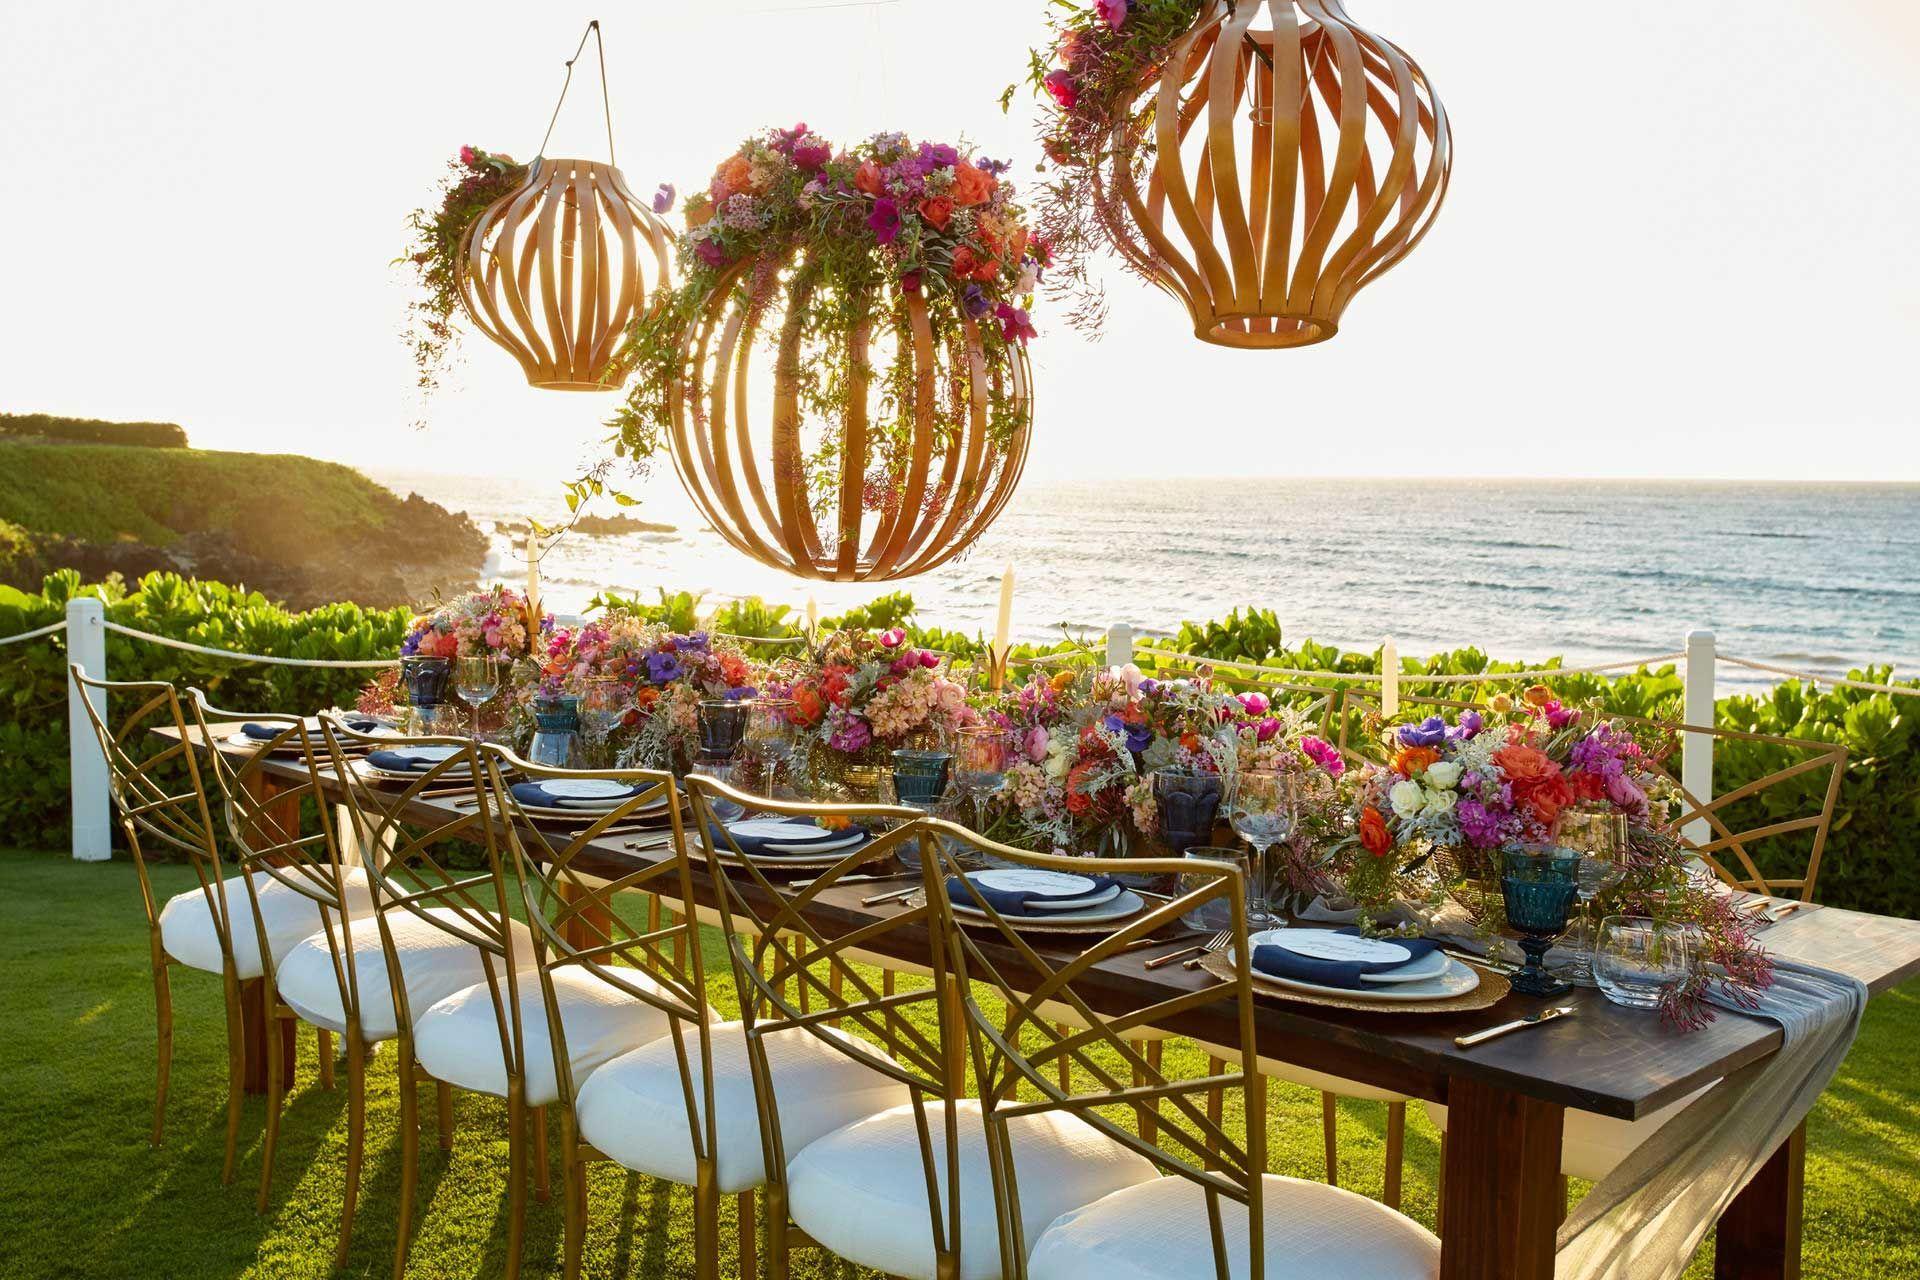 Hawaii Wedding Venues For Any Budget Wedding Venues Hawaii Maui Weddings Venues Maui Weddings